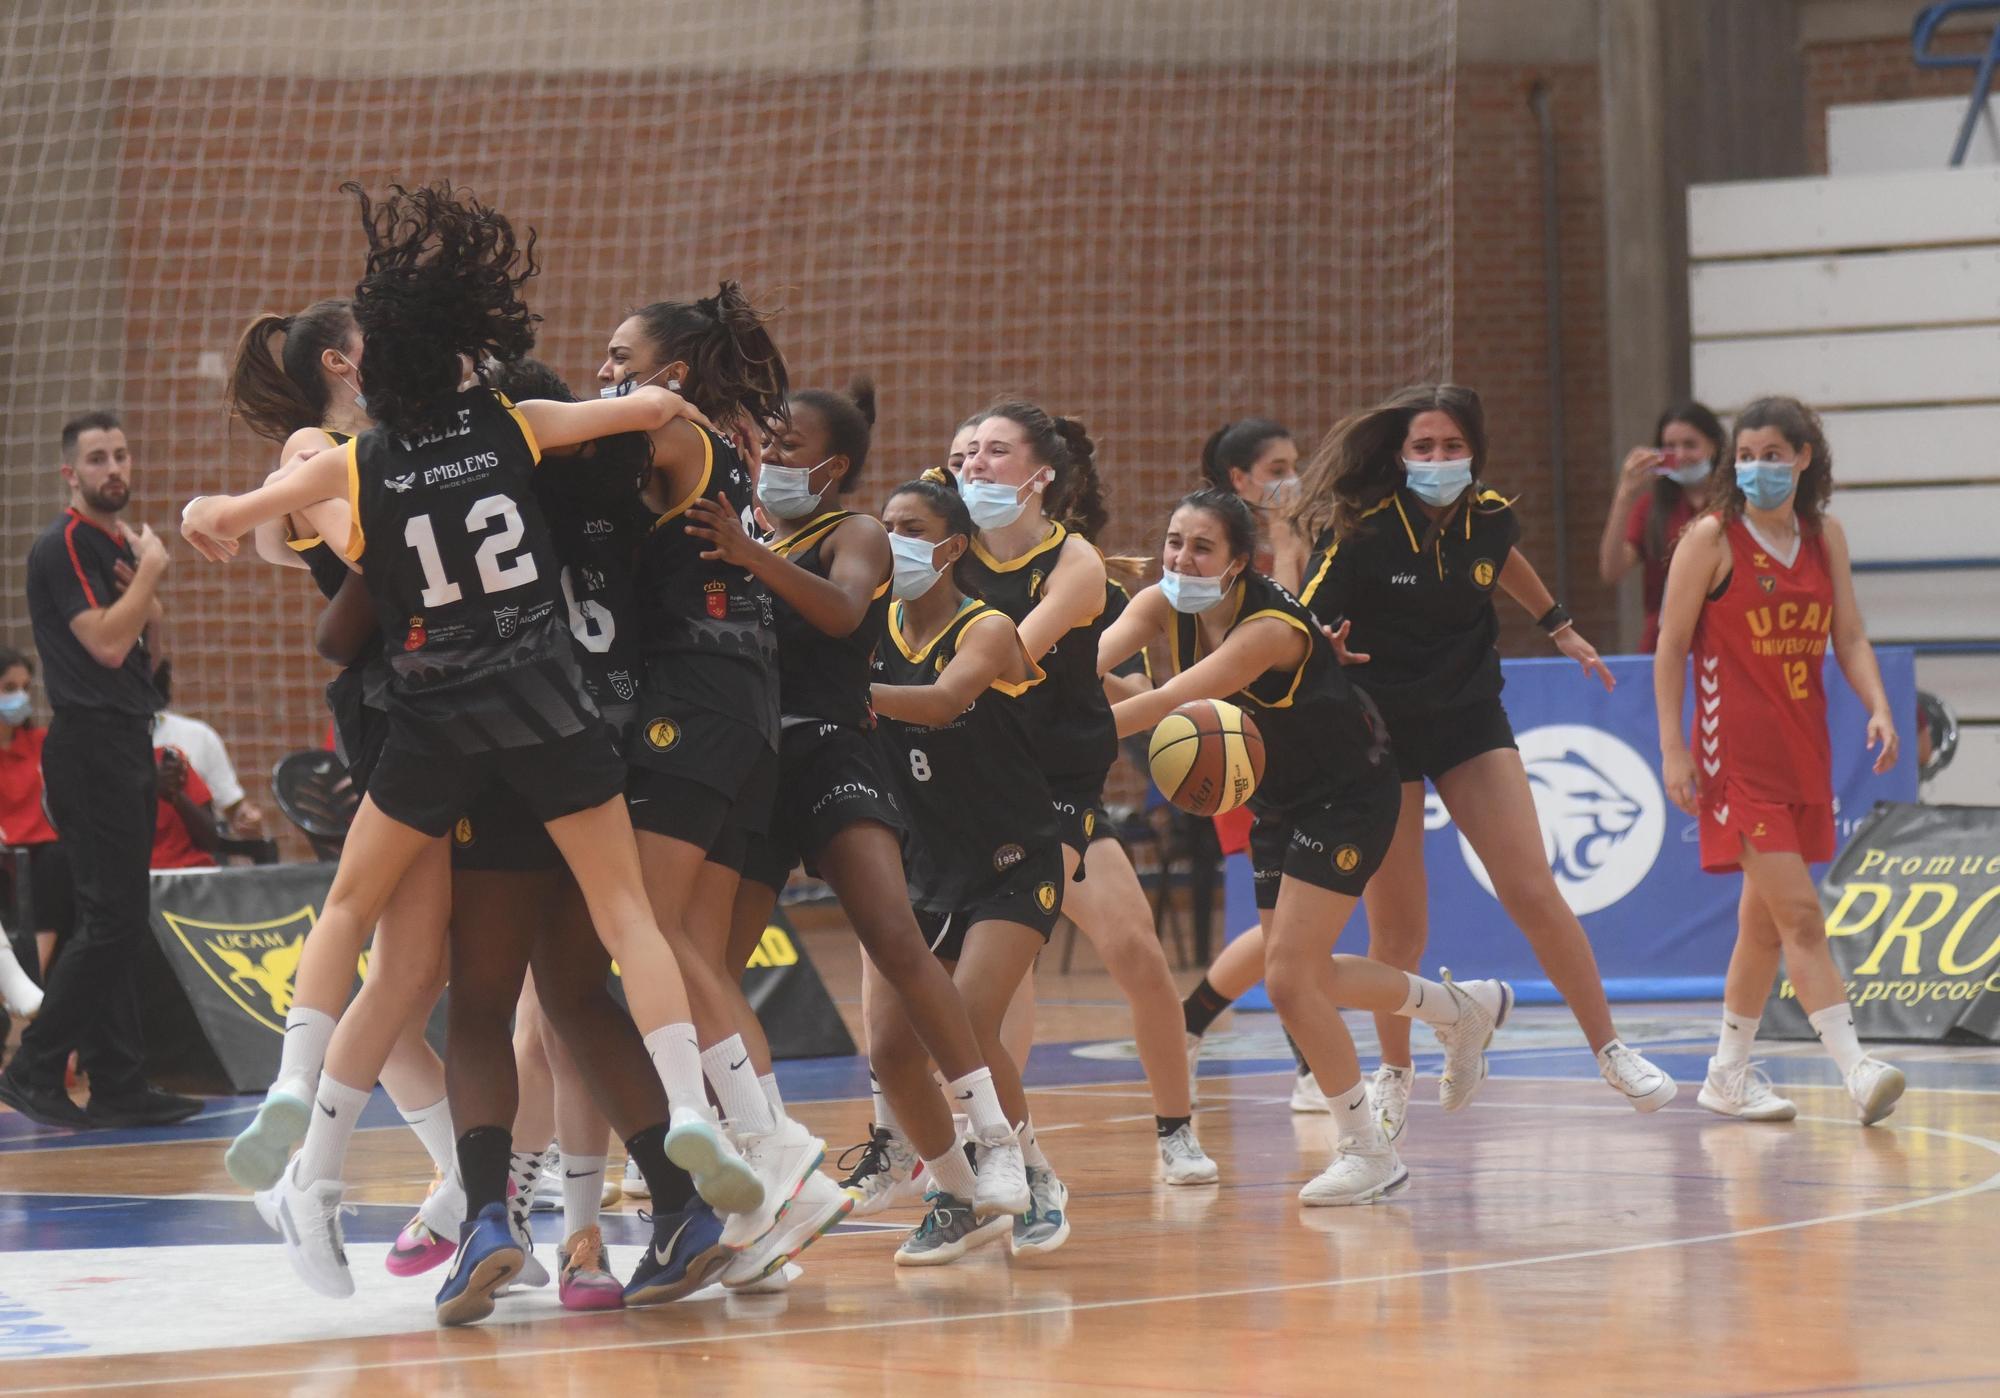 Final de baloncesto junior femenino